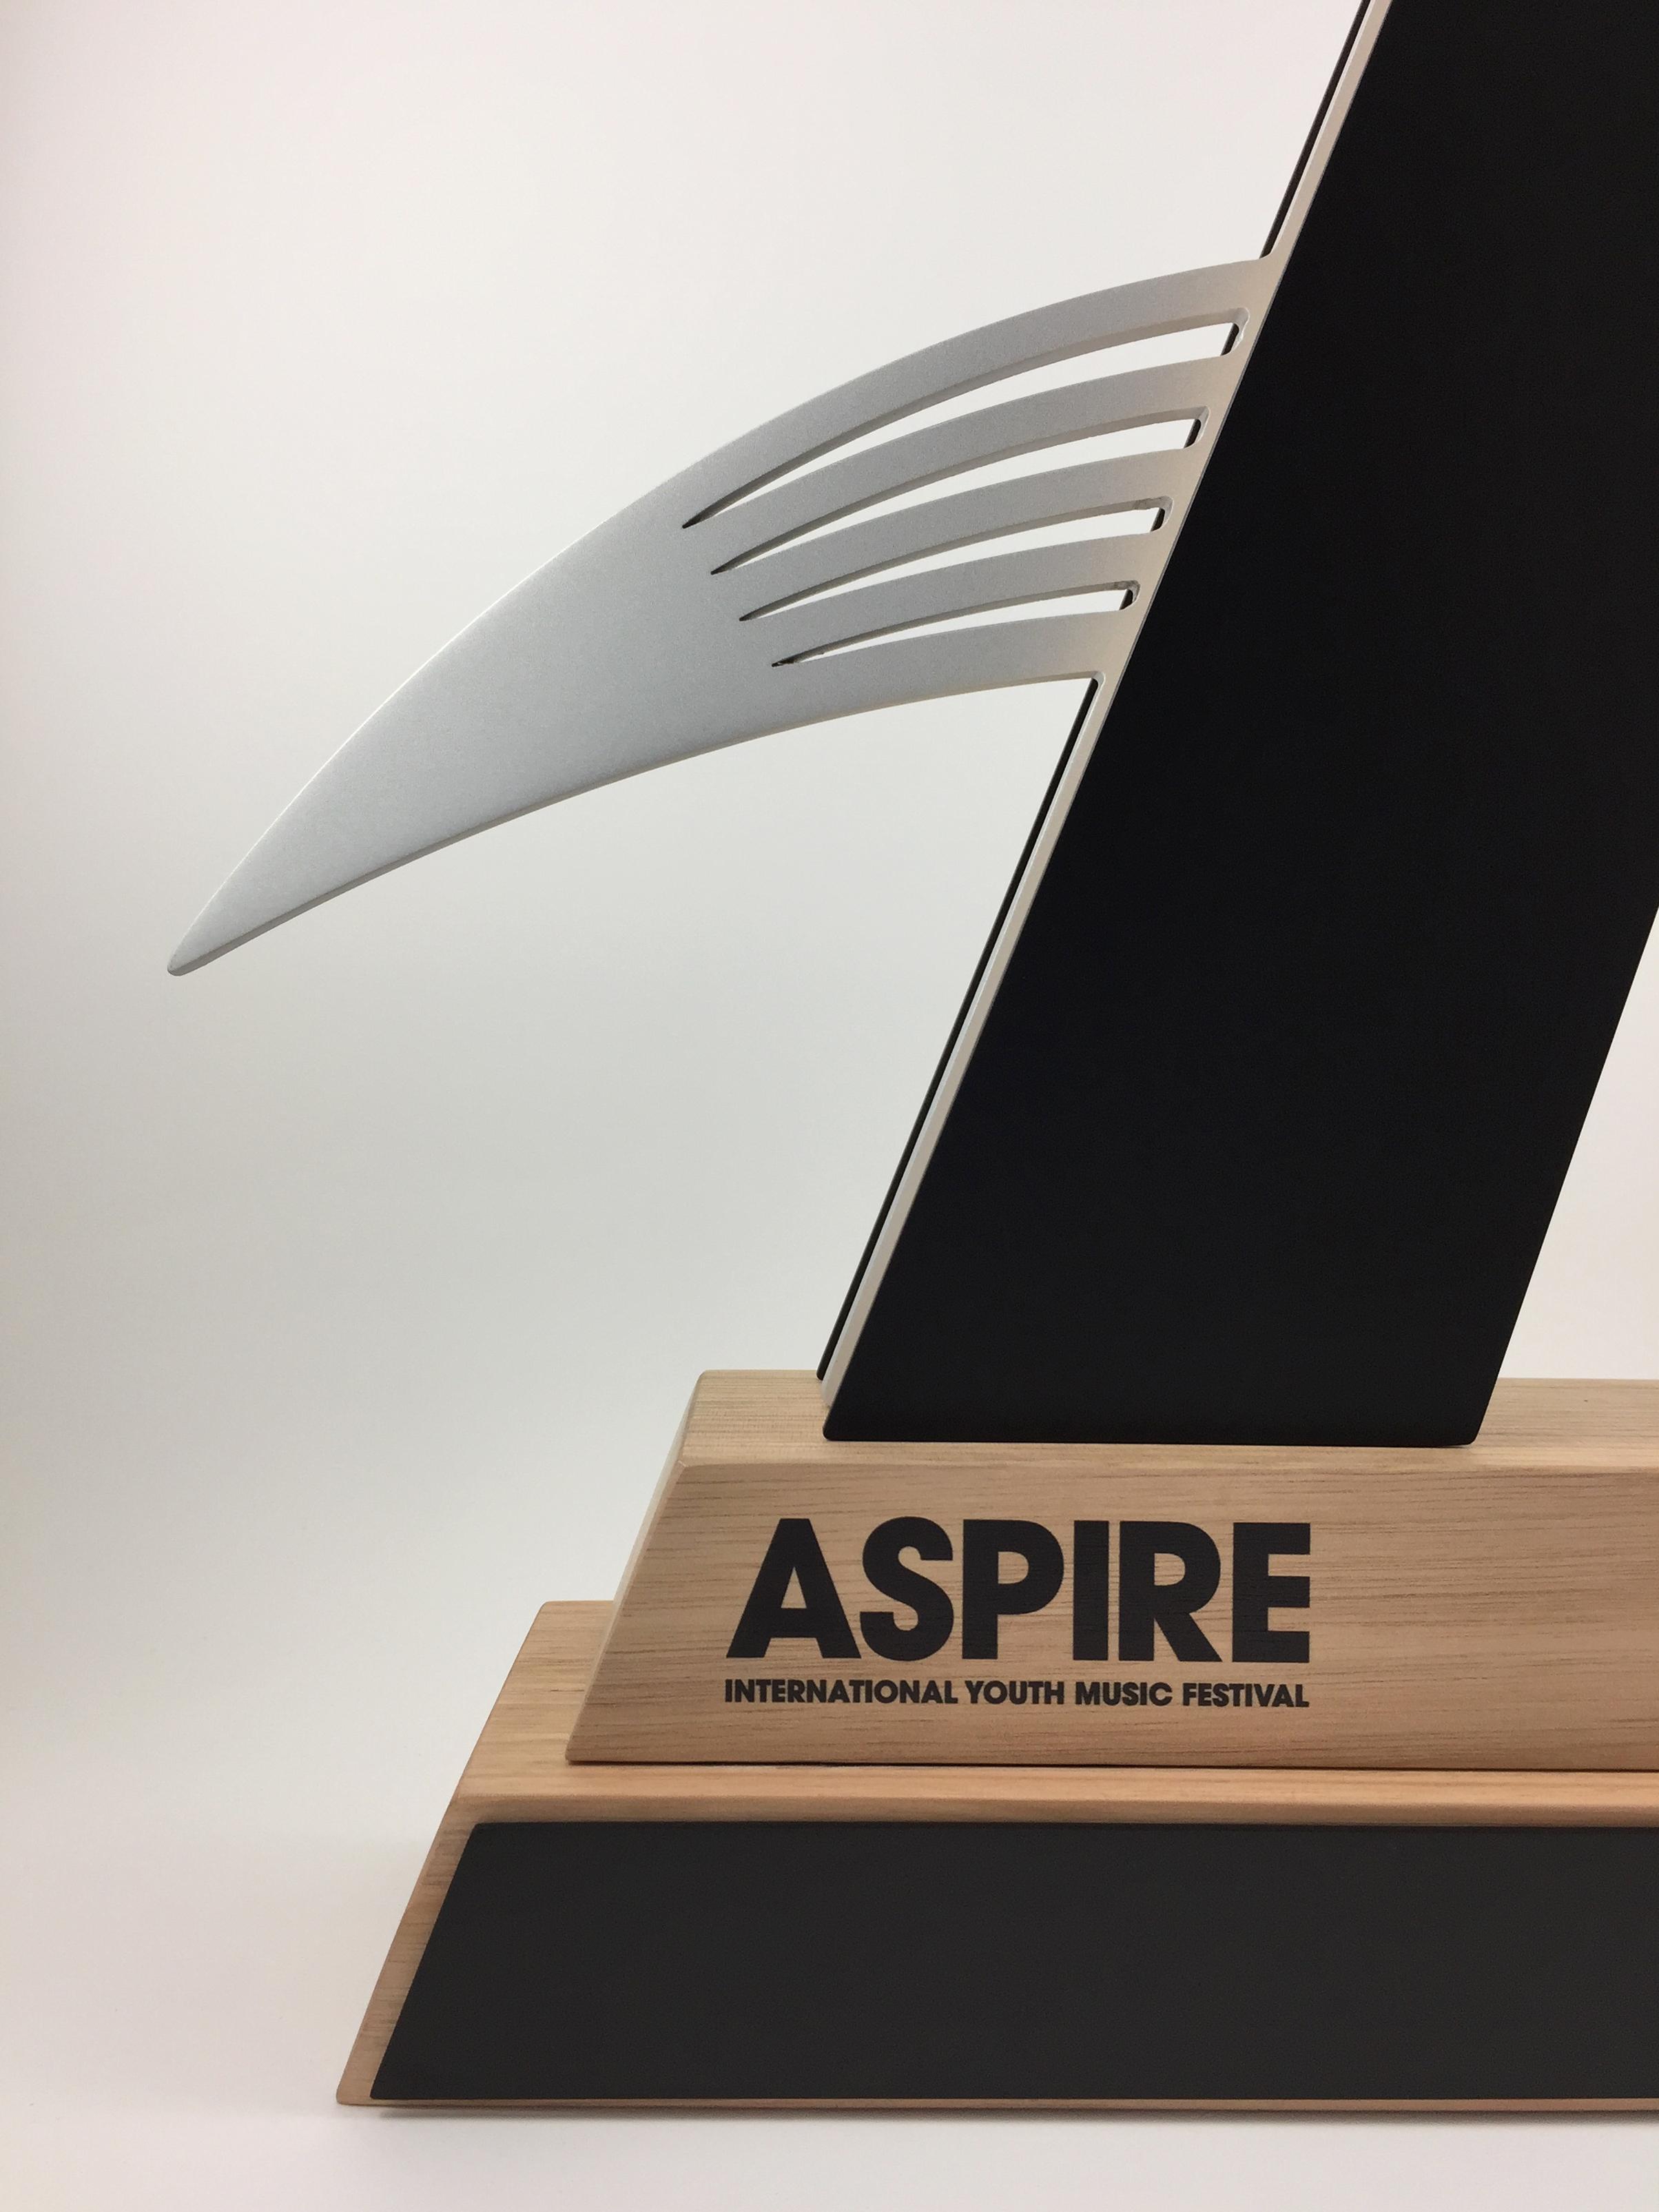 aspire-timber-metal-eco-trophy-awards-06.jpg